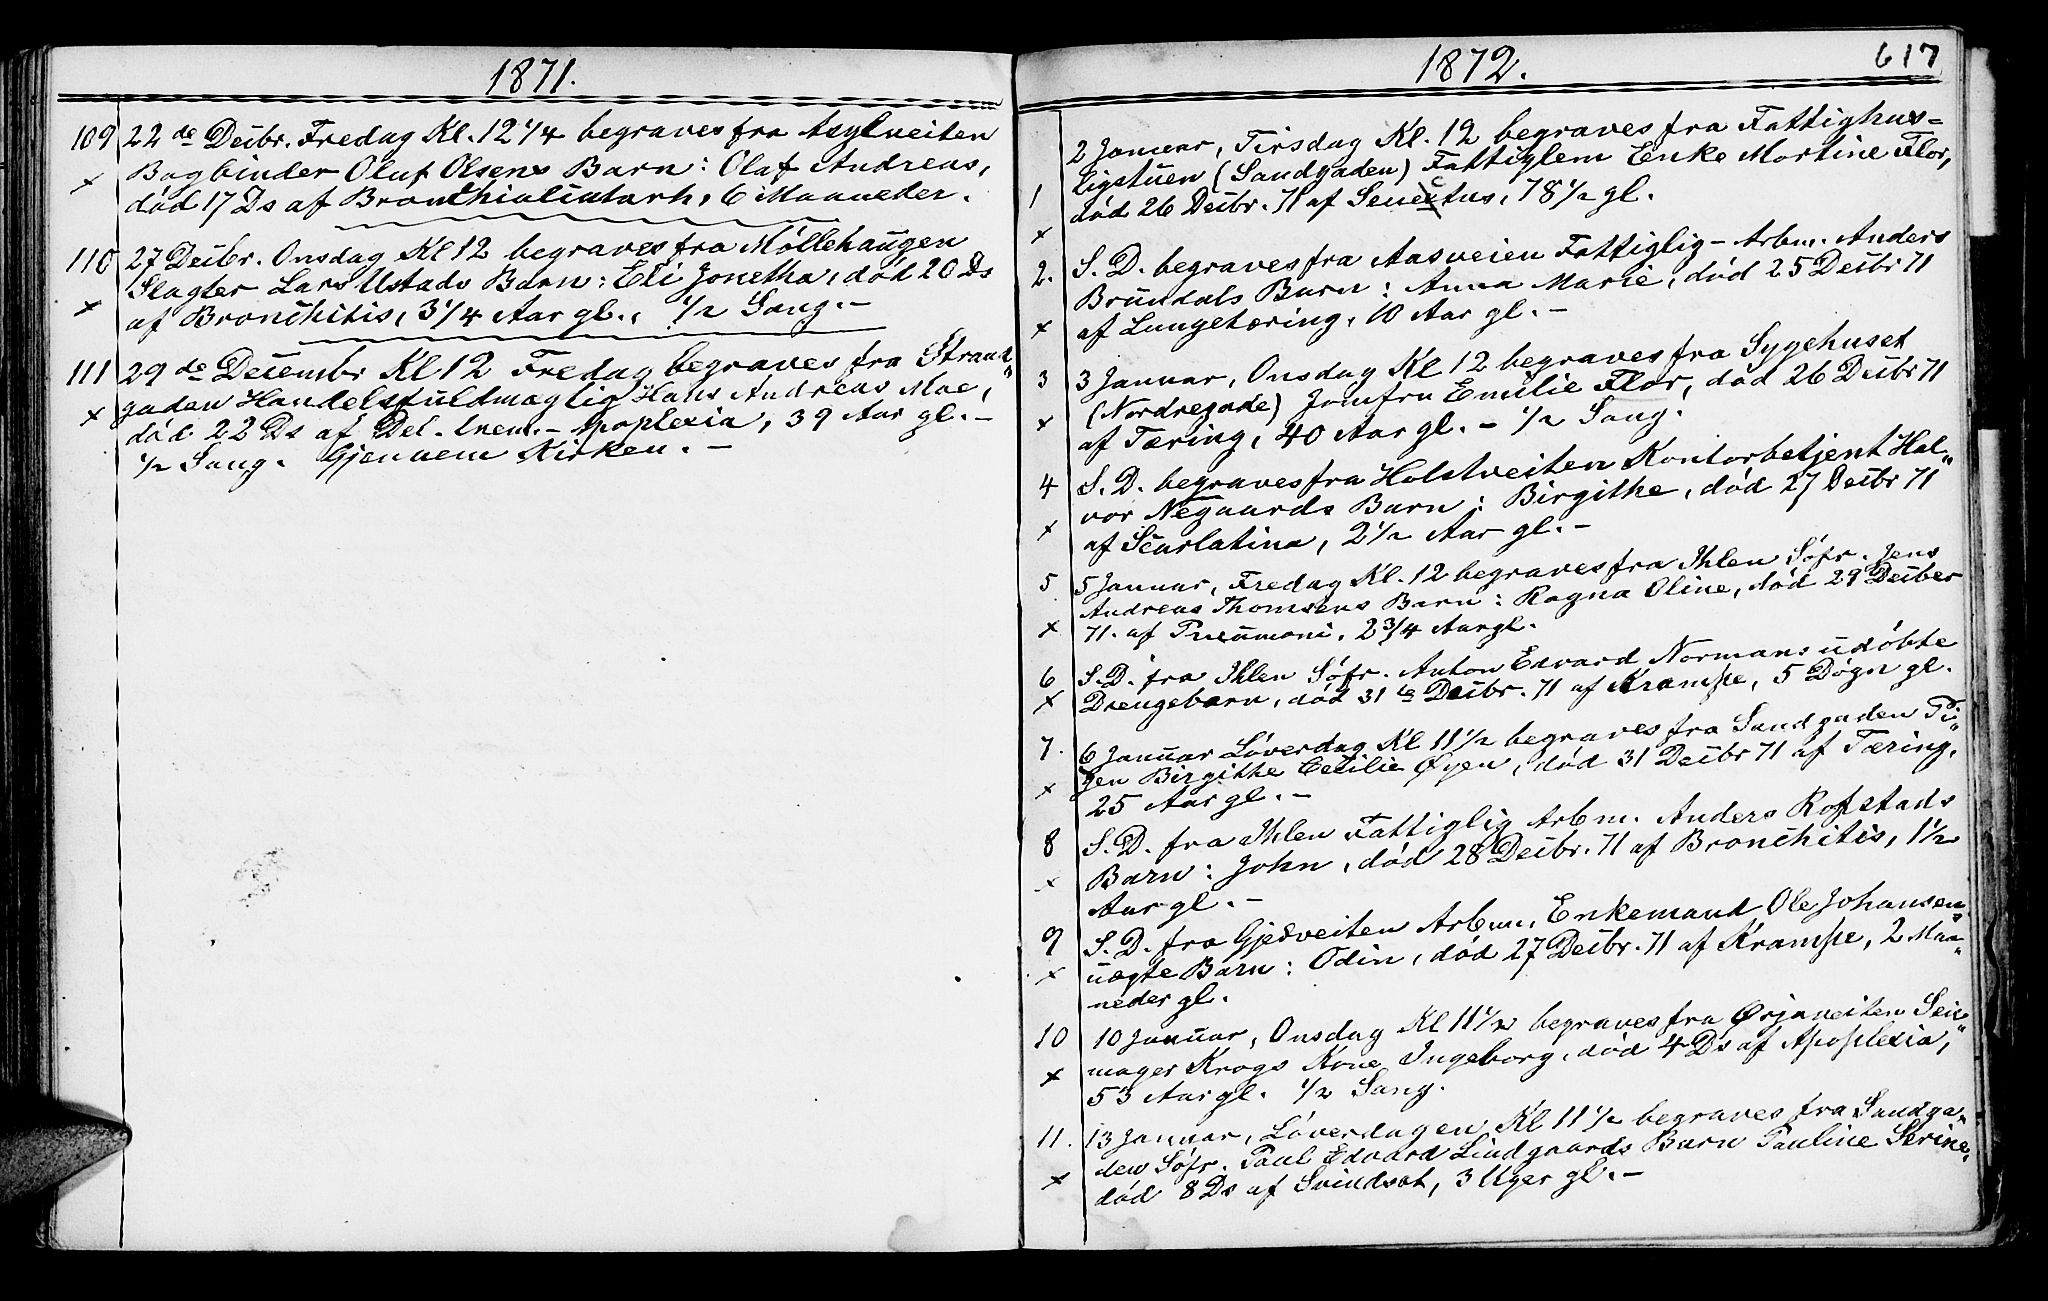 SAT, Ministerialprotokoller, klokkerbøker og fødselsregistre - Sør-Trøndelag, 602/L0140: Klokkerbok nr. 602C08, 1864-1872, s. 616a-617a